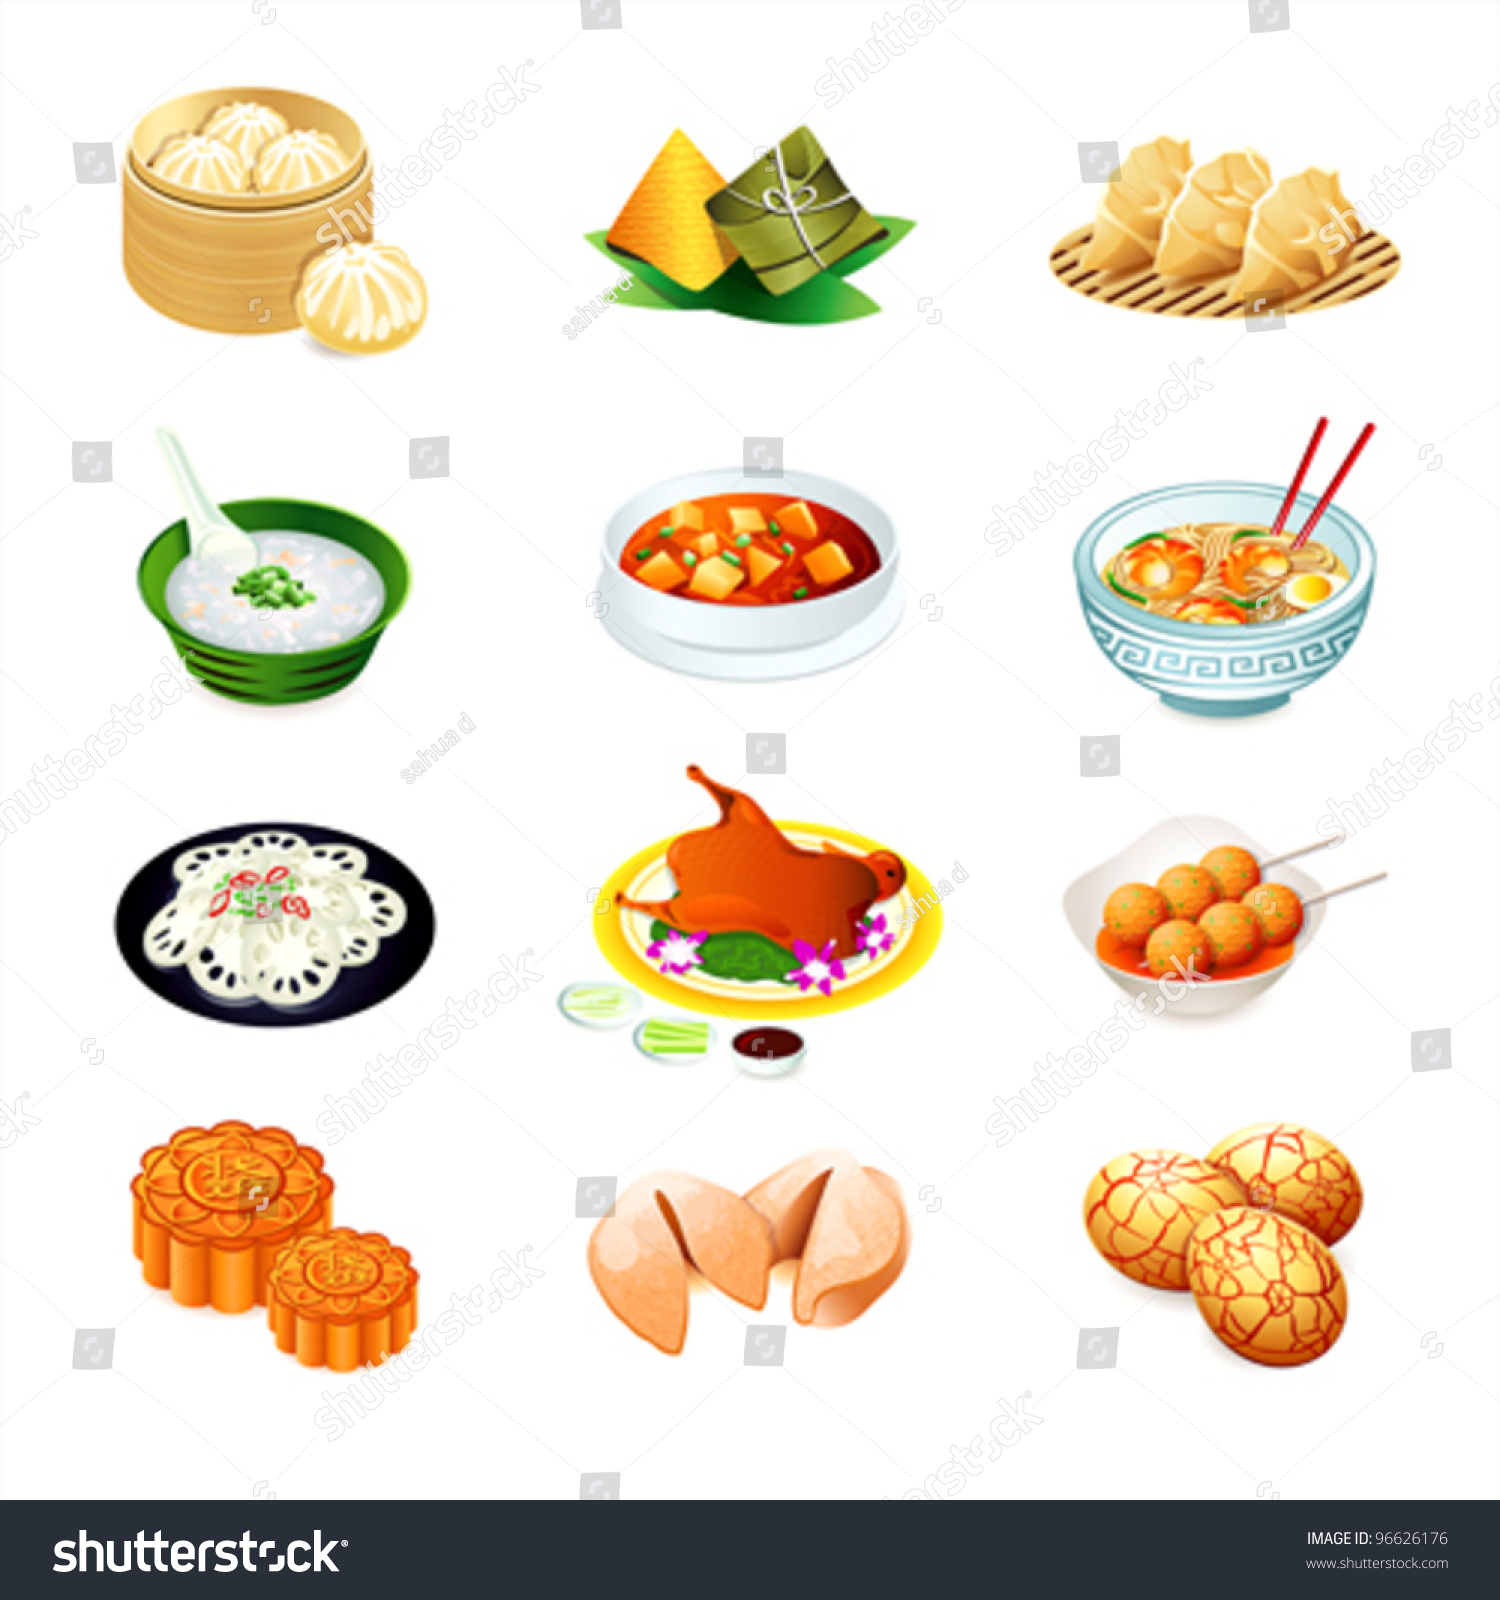 Chinese Food Mapo Tofu Calorie